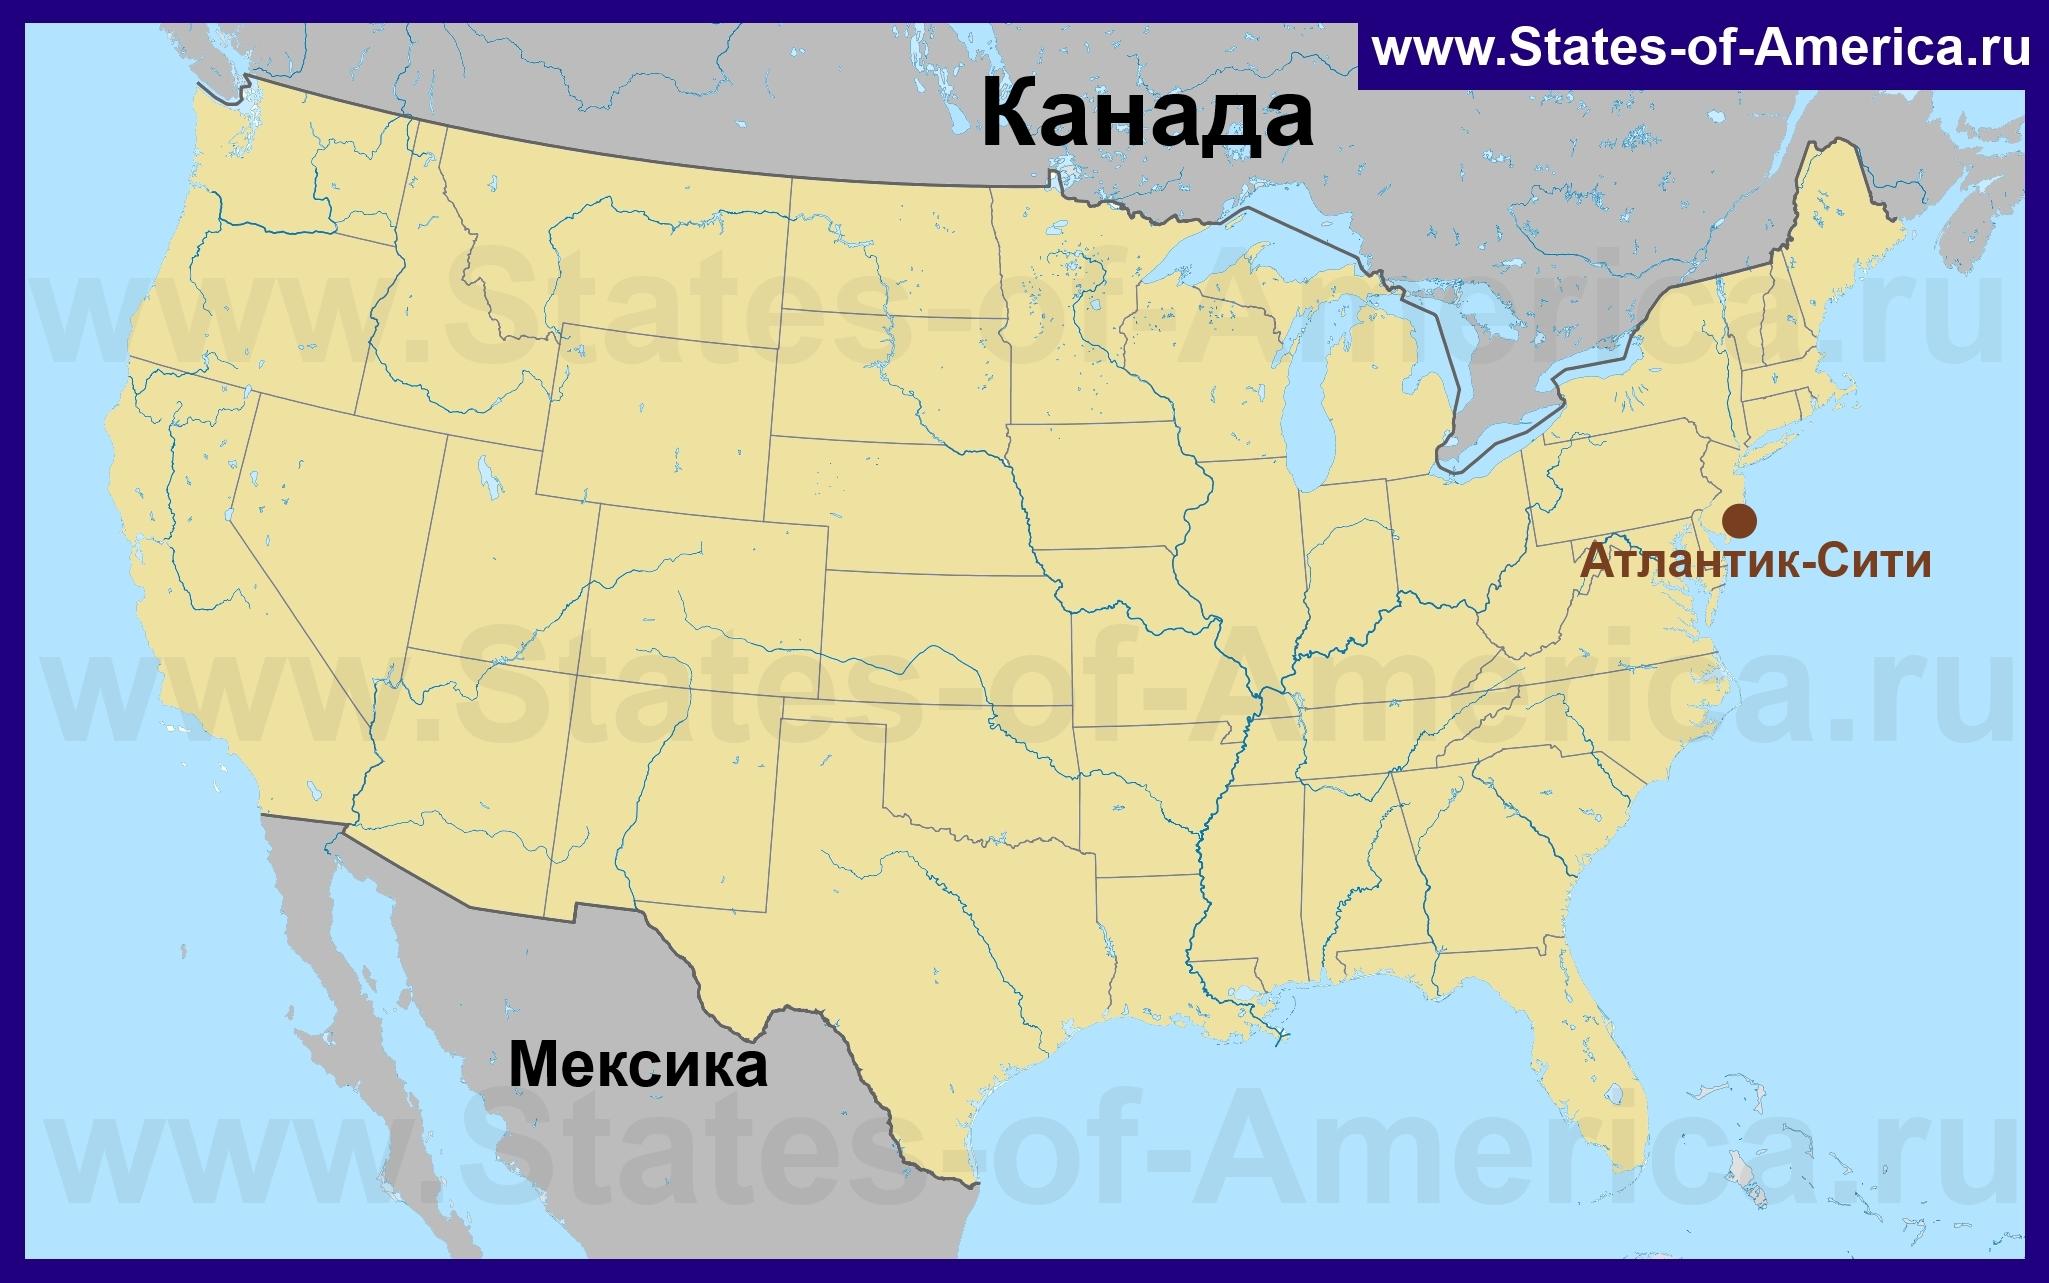 Карты Атлантик-Сити | Подробная карта города Атлантик-Сити ...: http://states-of-america.ru/karty-gorodov-ssha/atlantik-siti/